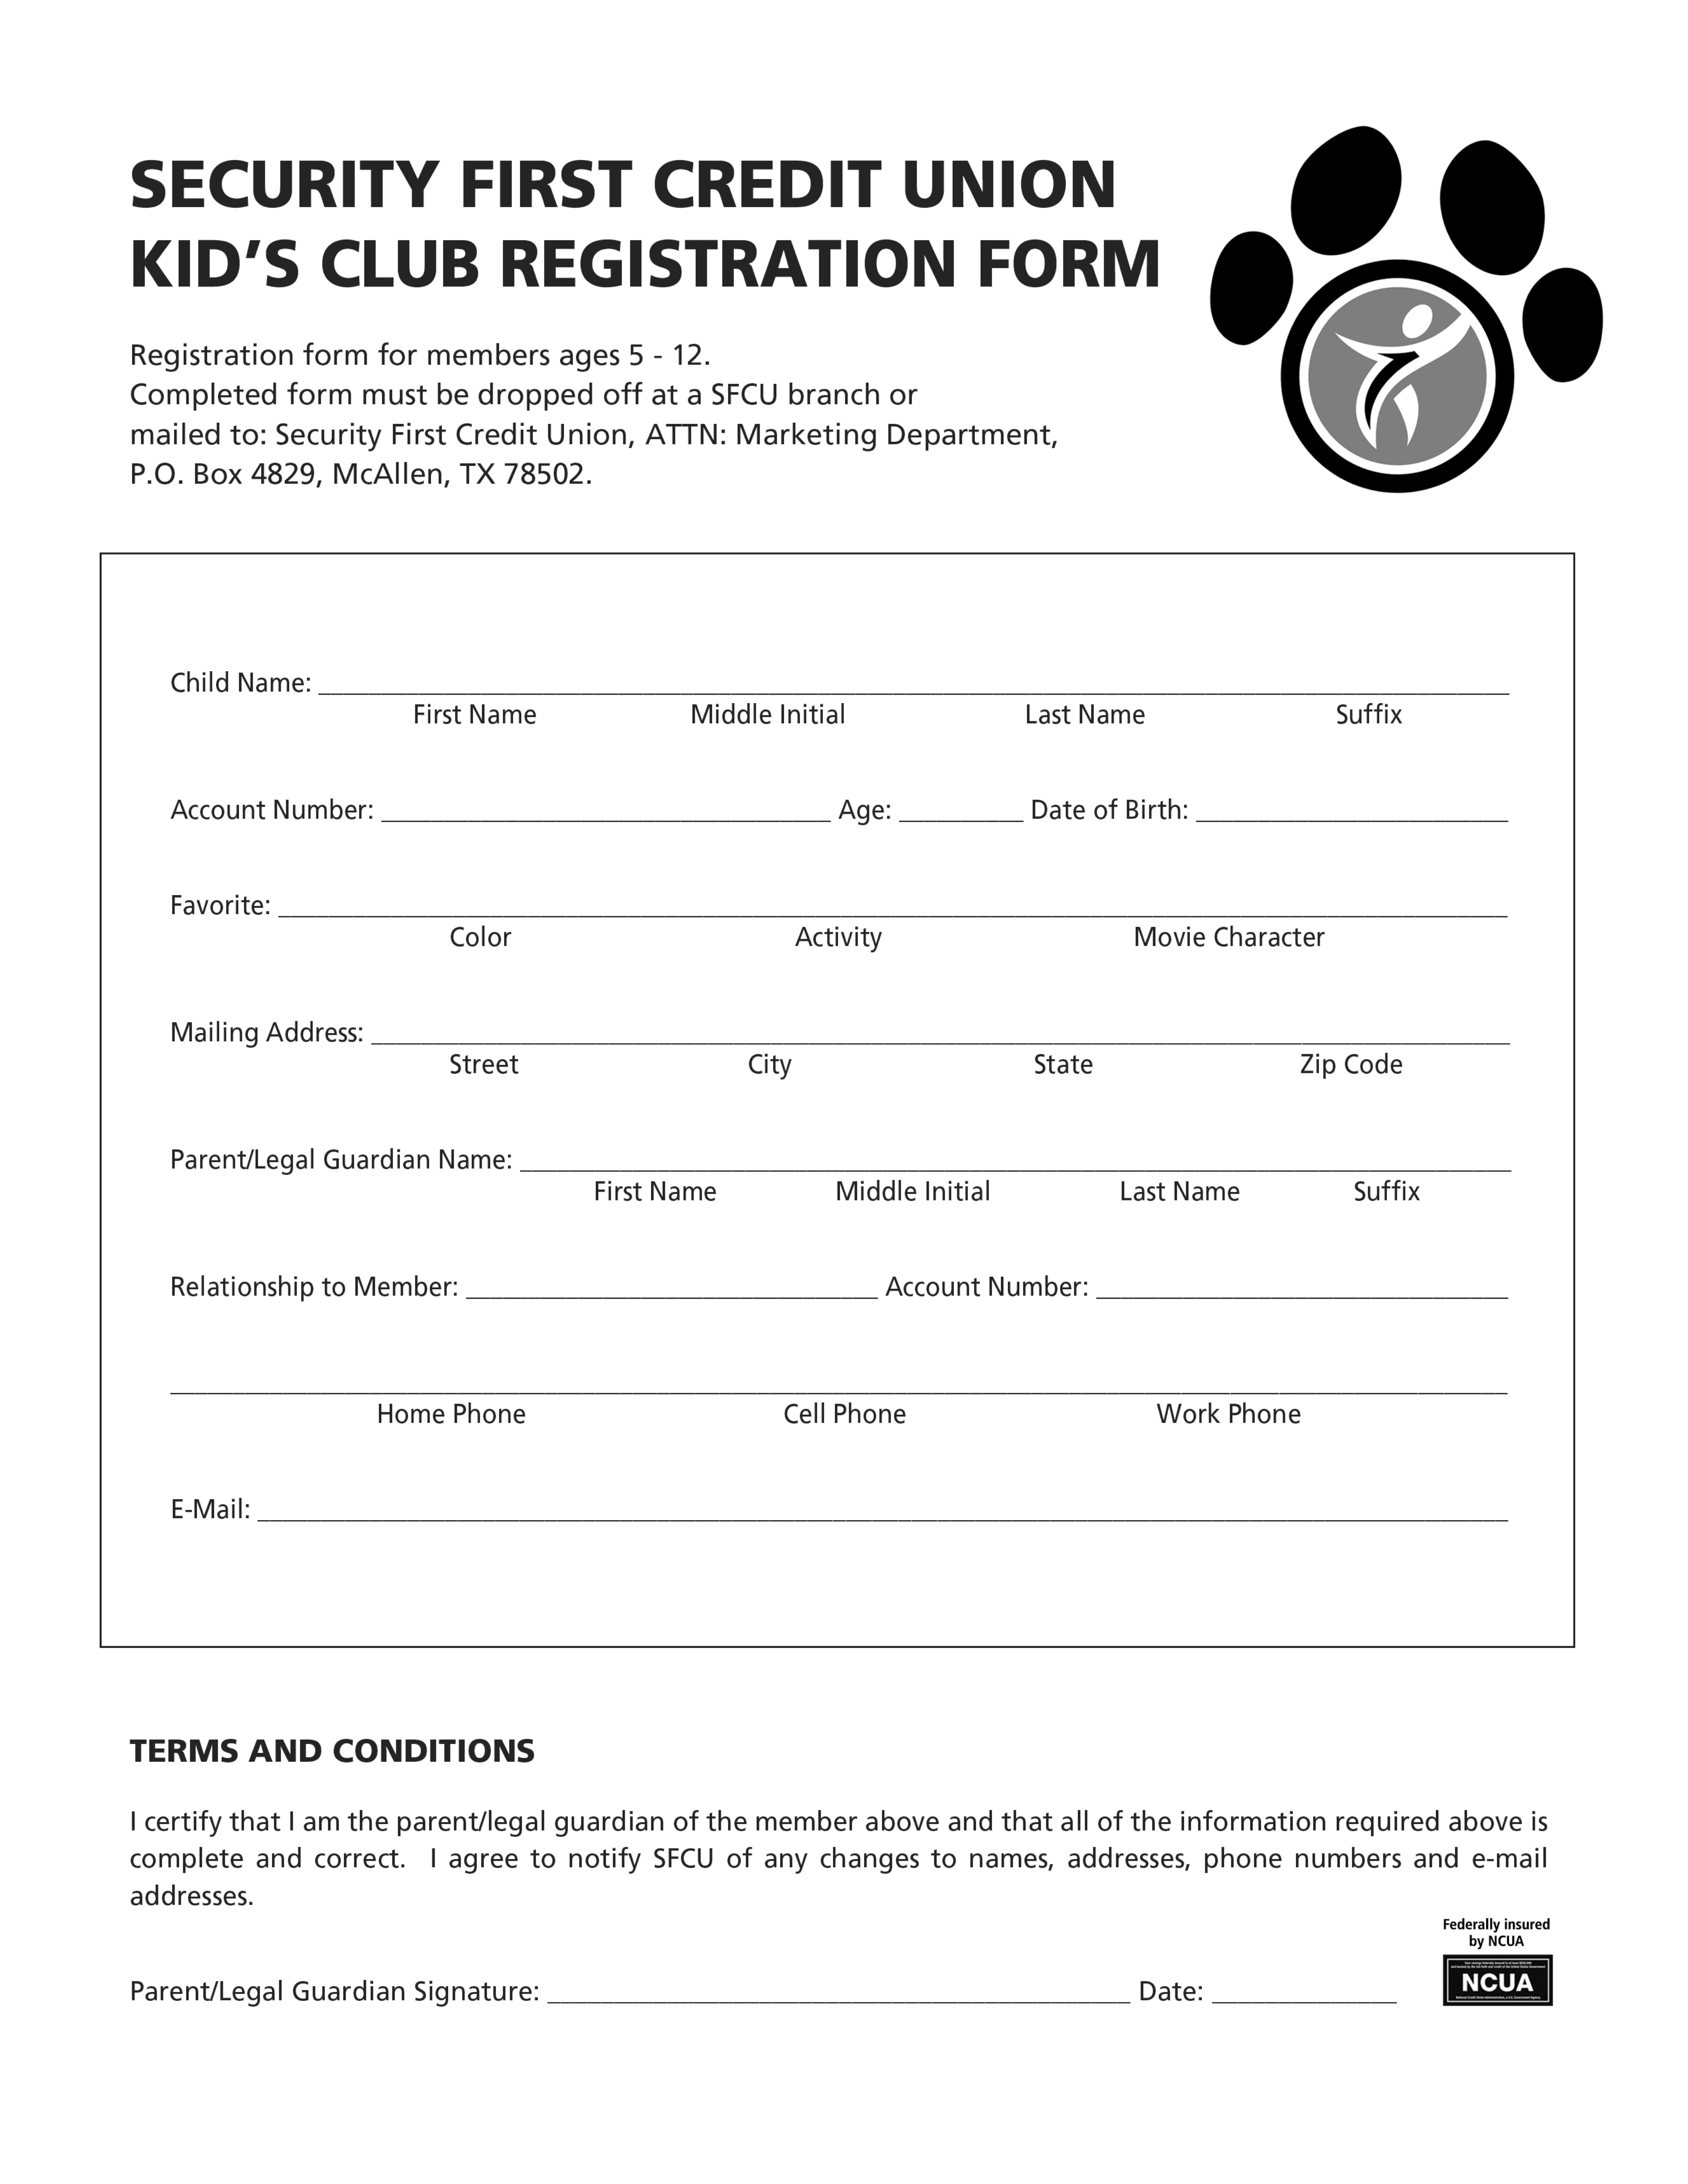 Kids Club- Registration form